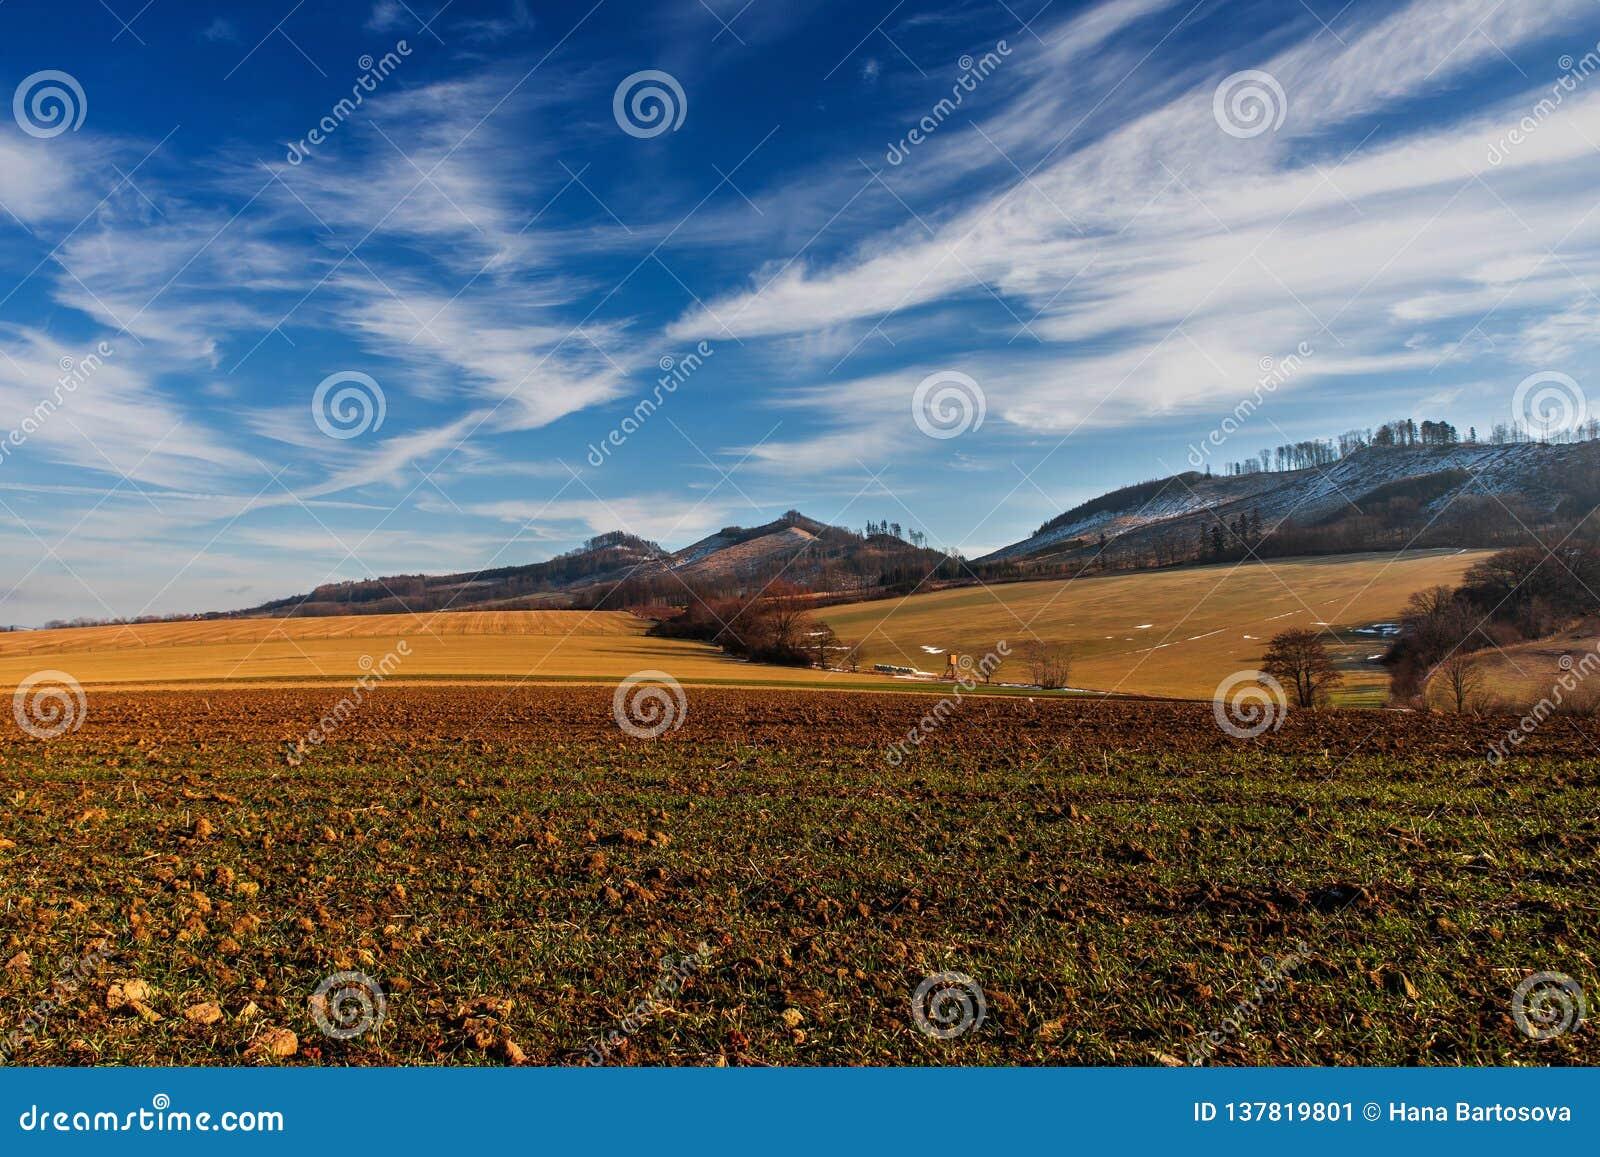 Landscape with hills and fields near Podhradni Lhota, Czech republic